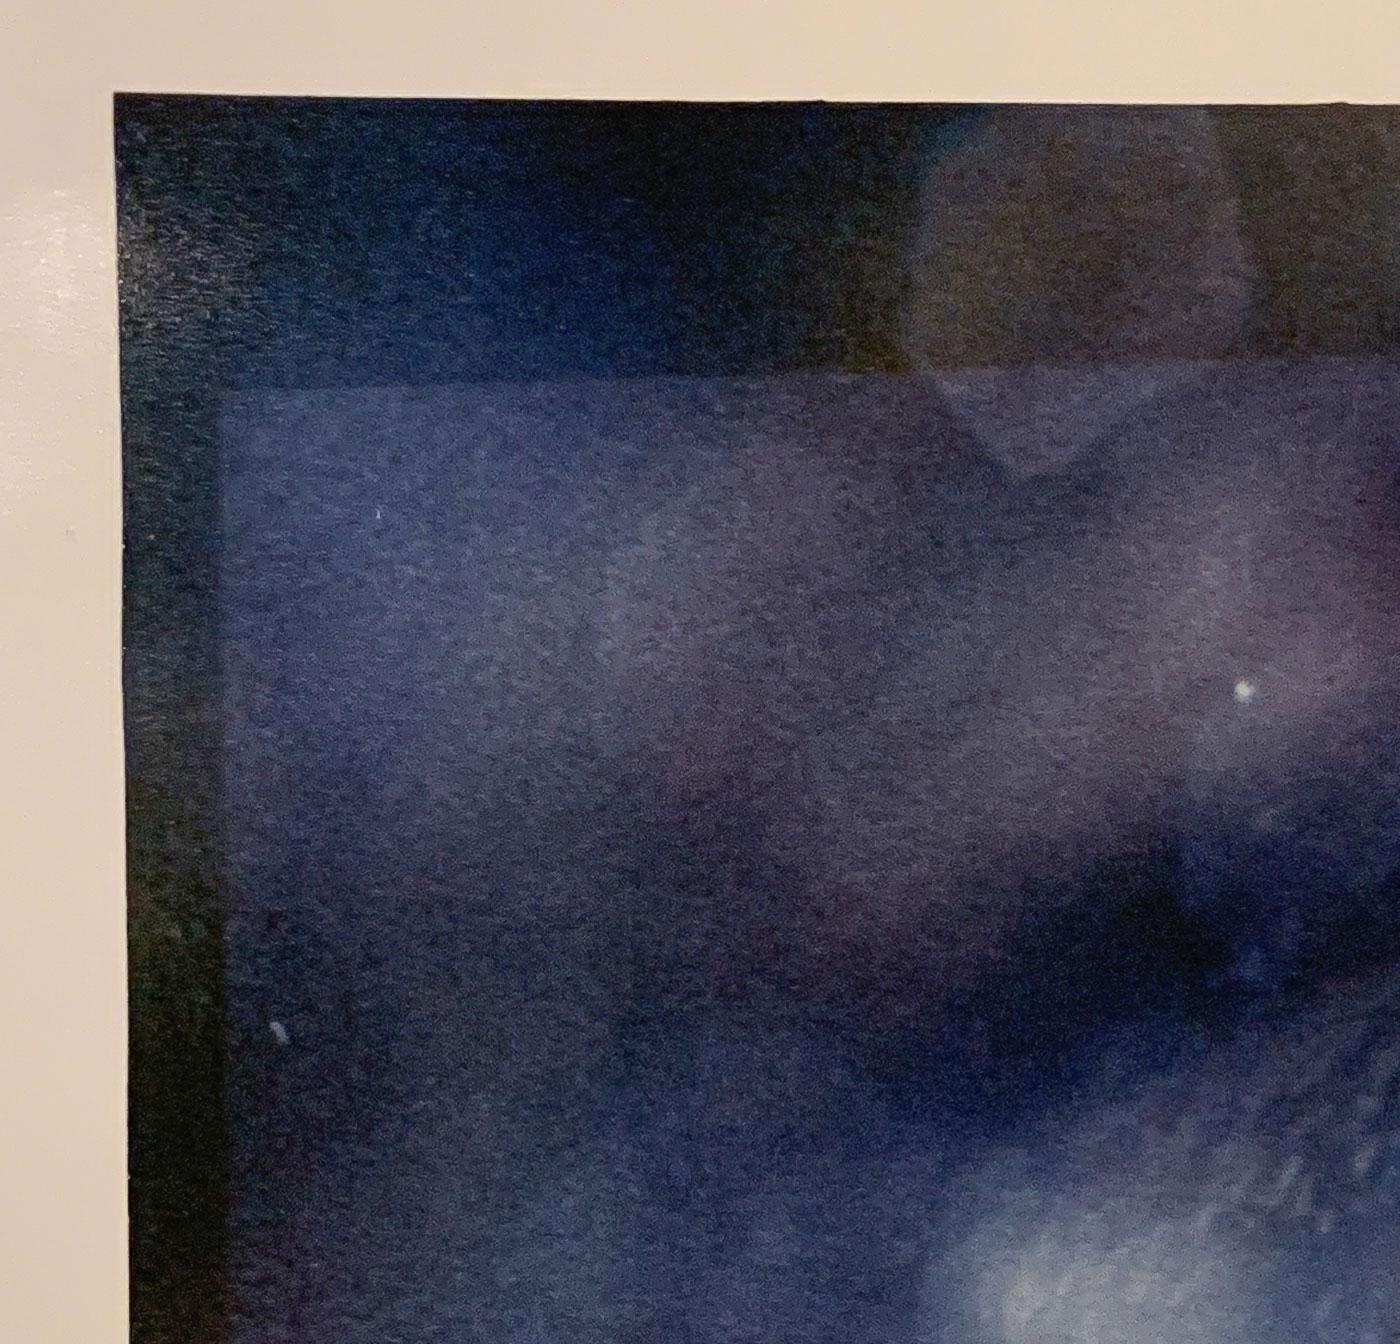 CINDY SHERMAN SIGNED PHOTO - Image 6 of 7